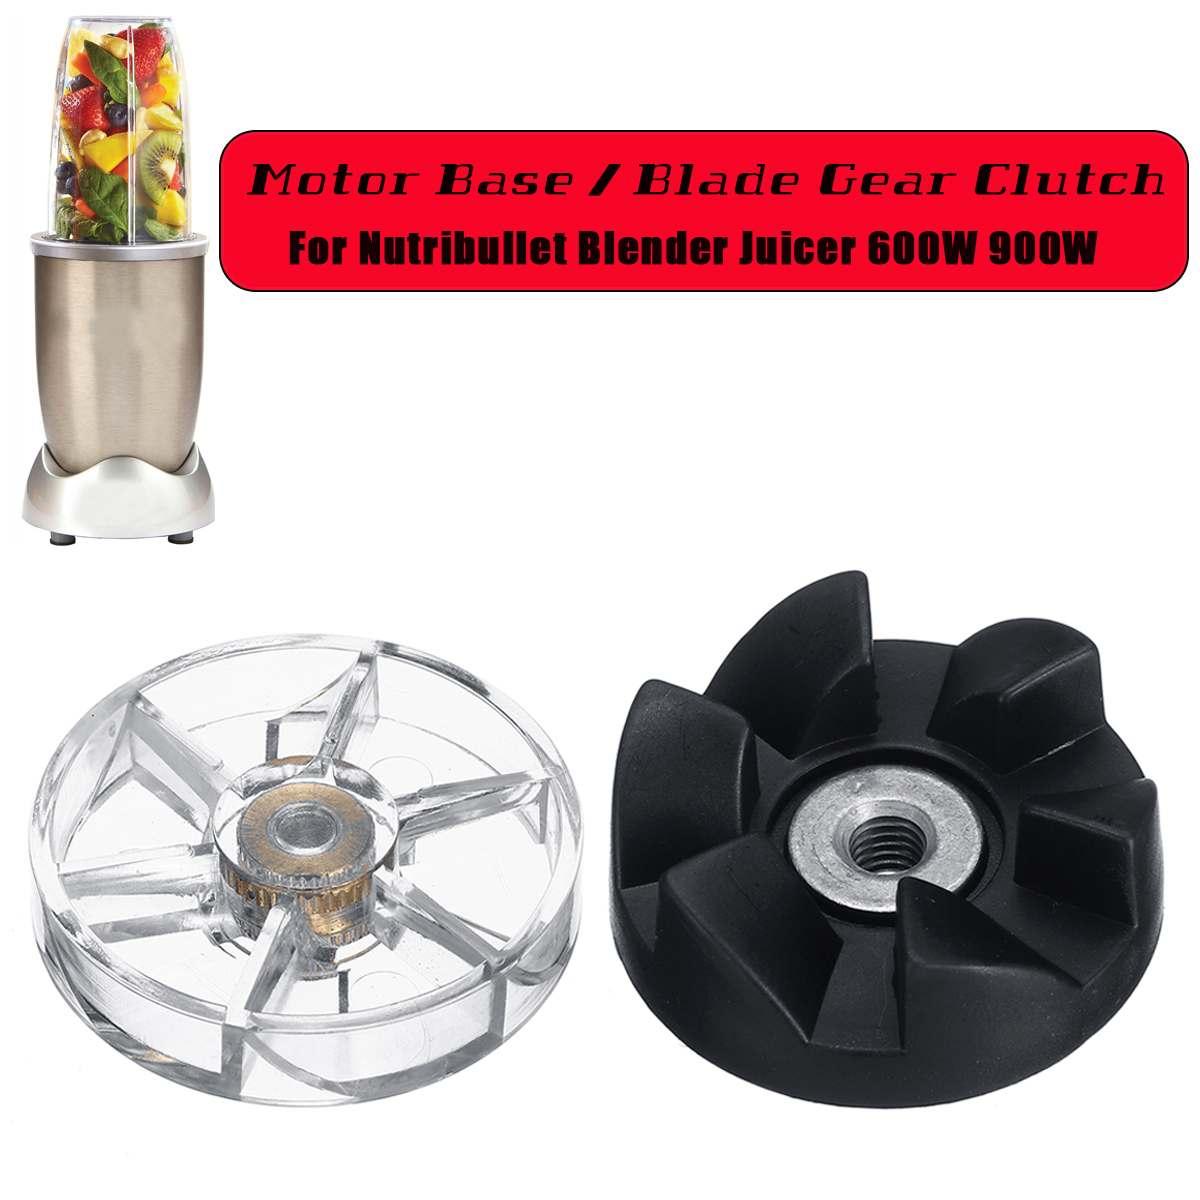 1pc Motor Base/Blade Gear Clutch Juicer Replacement Part For Nutribullet Juicer 600W/900W1pc Motor Base/Blade Gear Clutch Juicer Replacement Part For Nutribullet Juicer 600W/900W